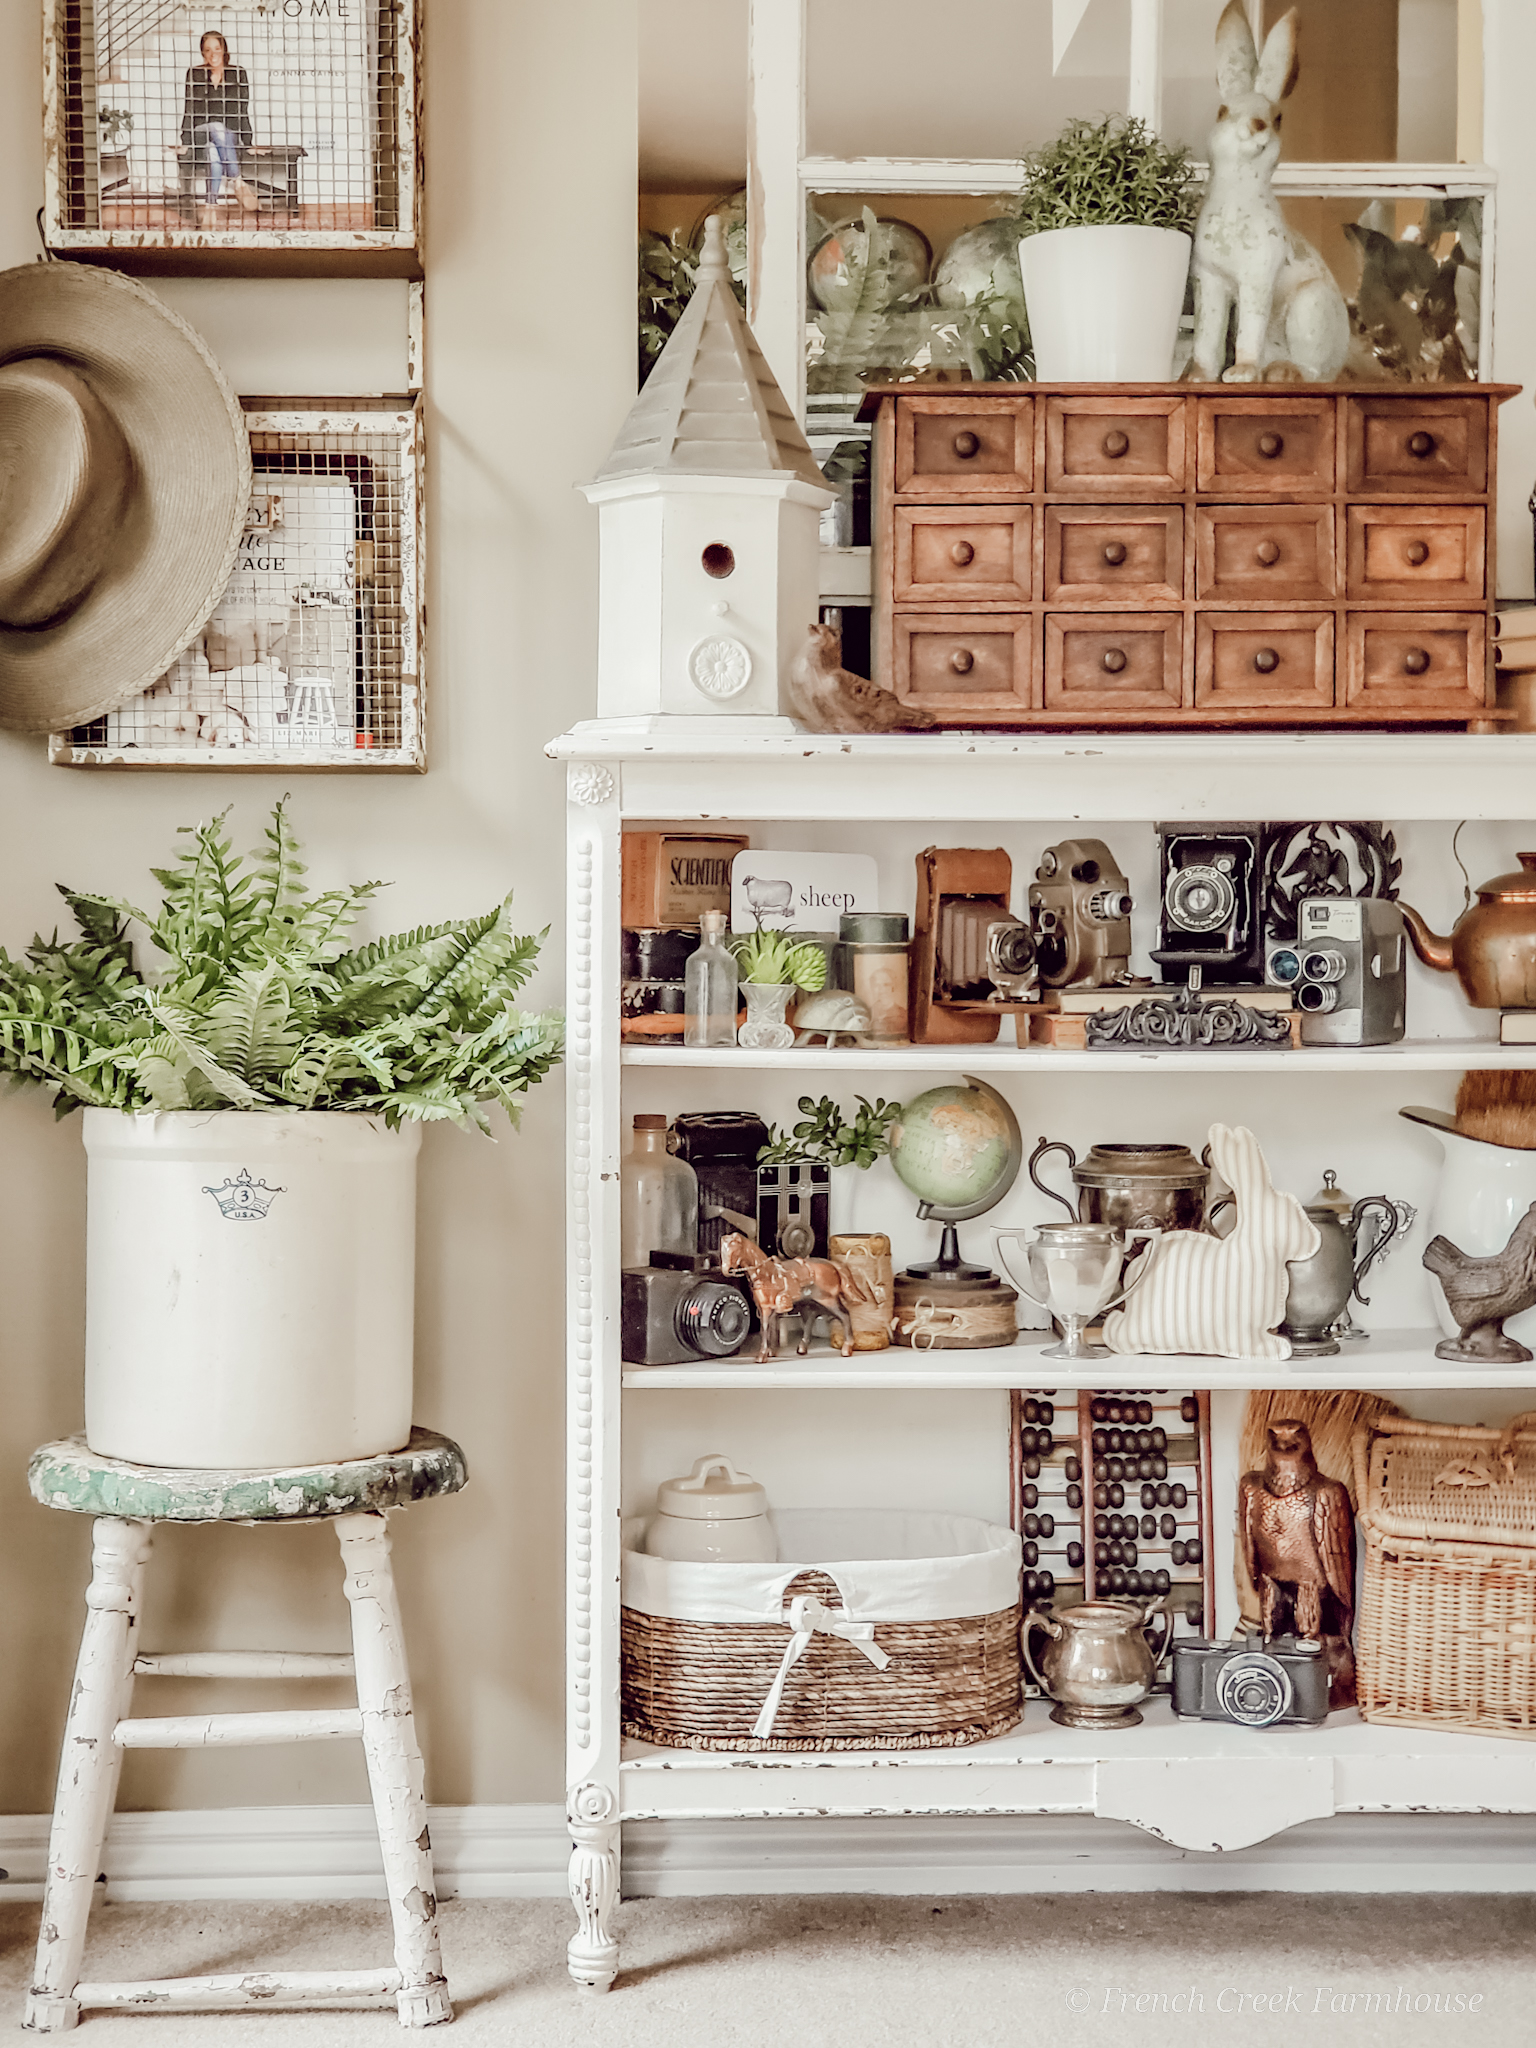 Vintage farmhouse shelves displaying antique finds